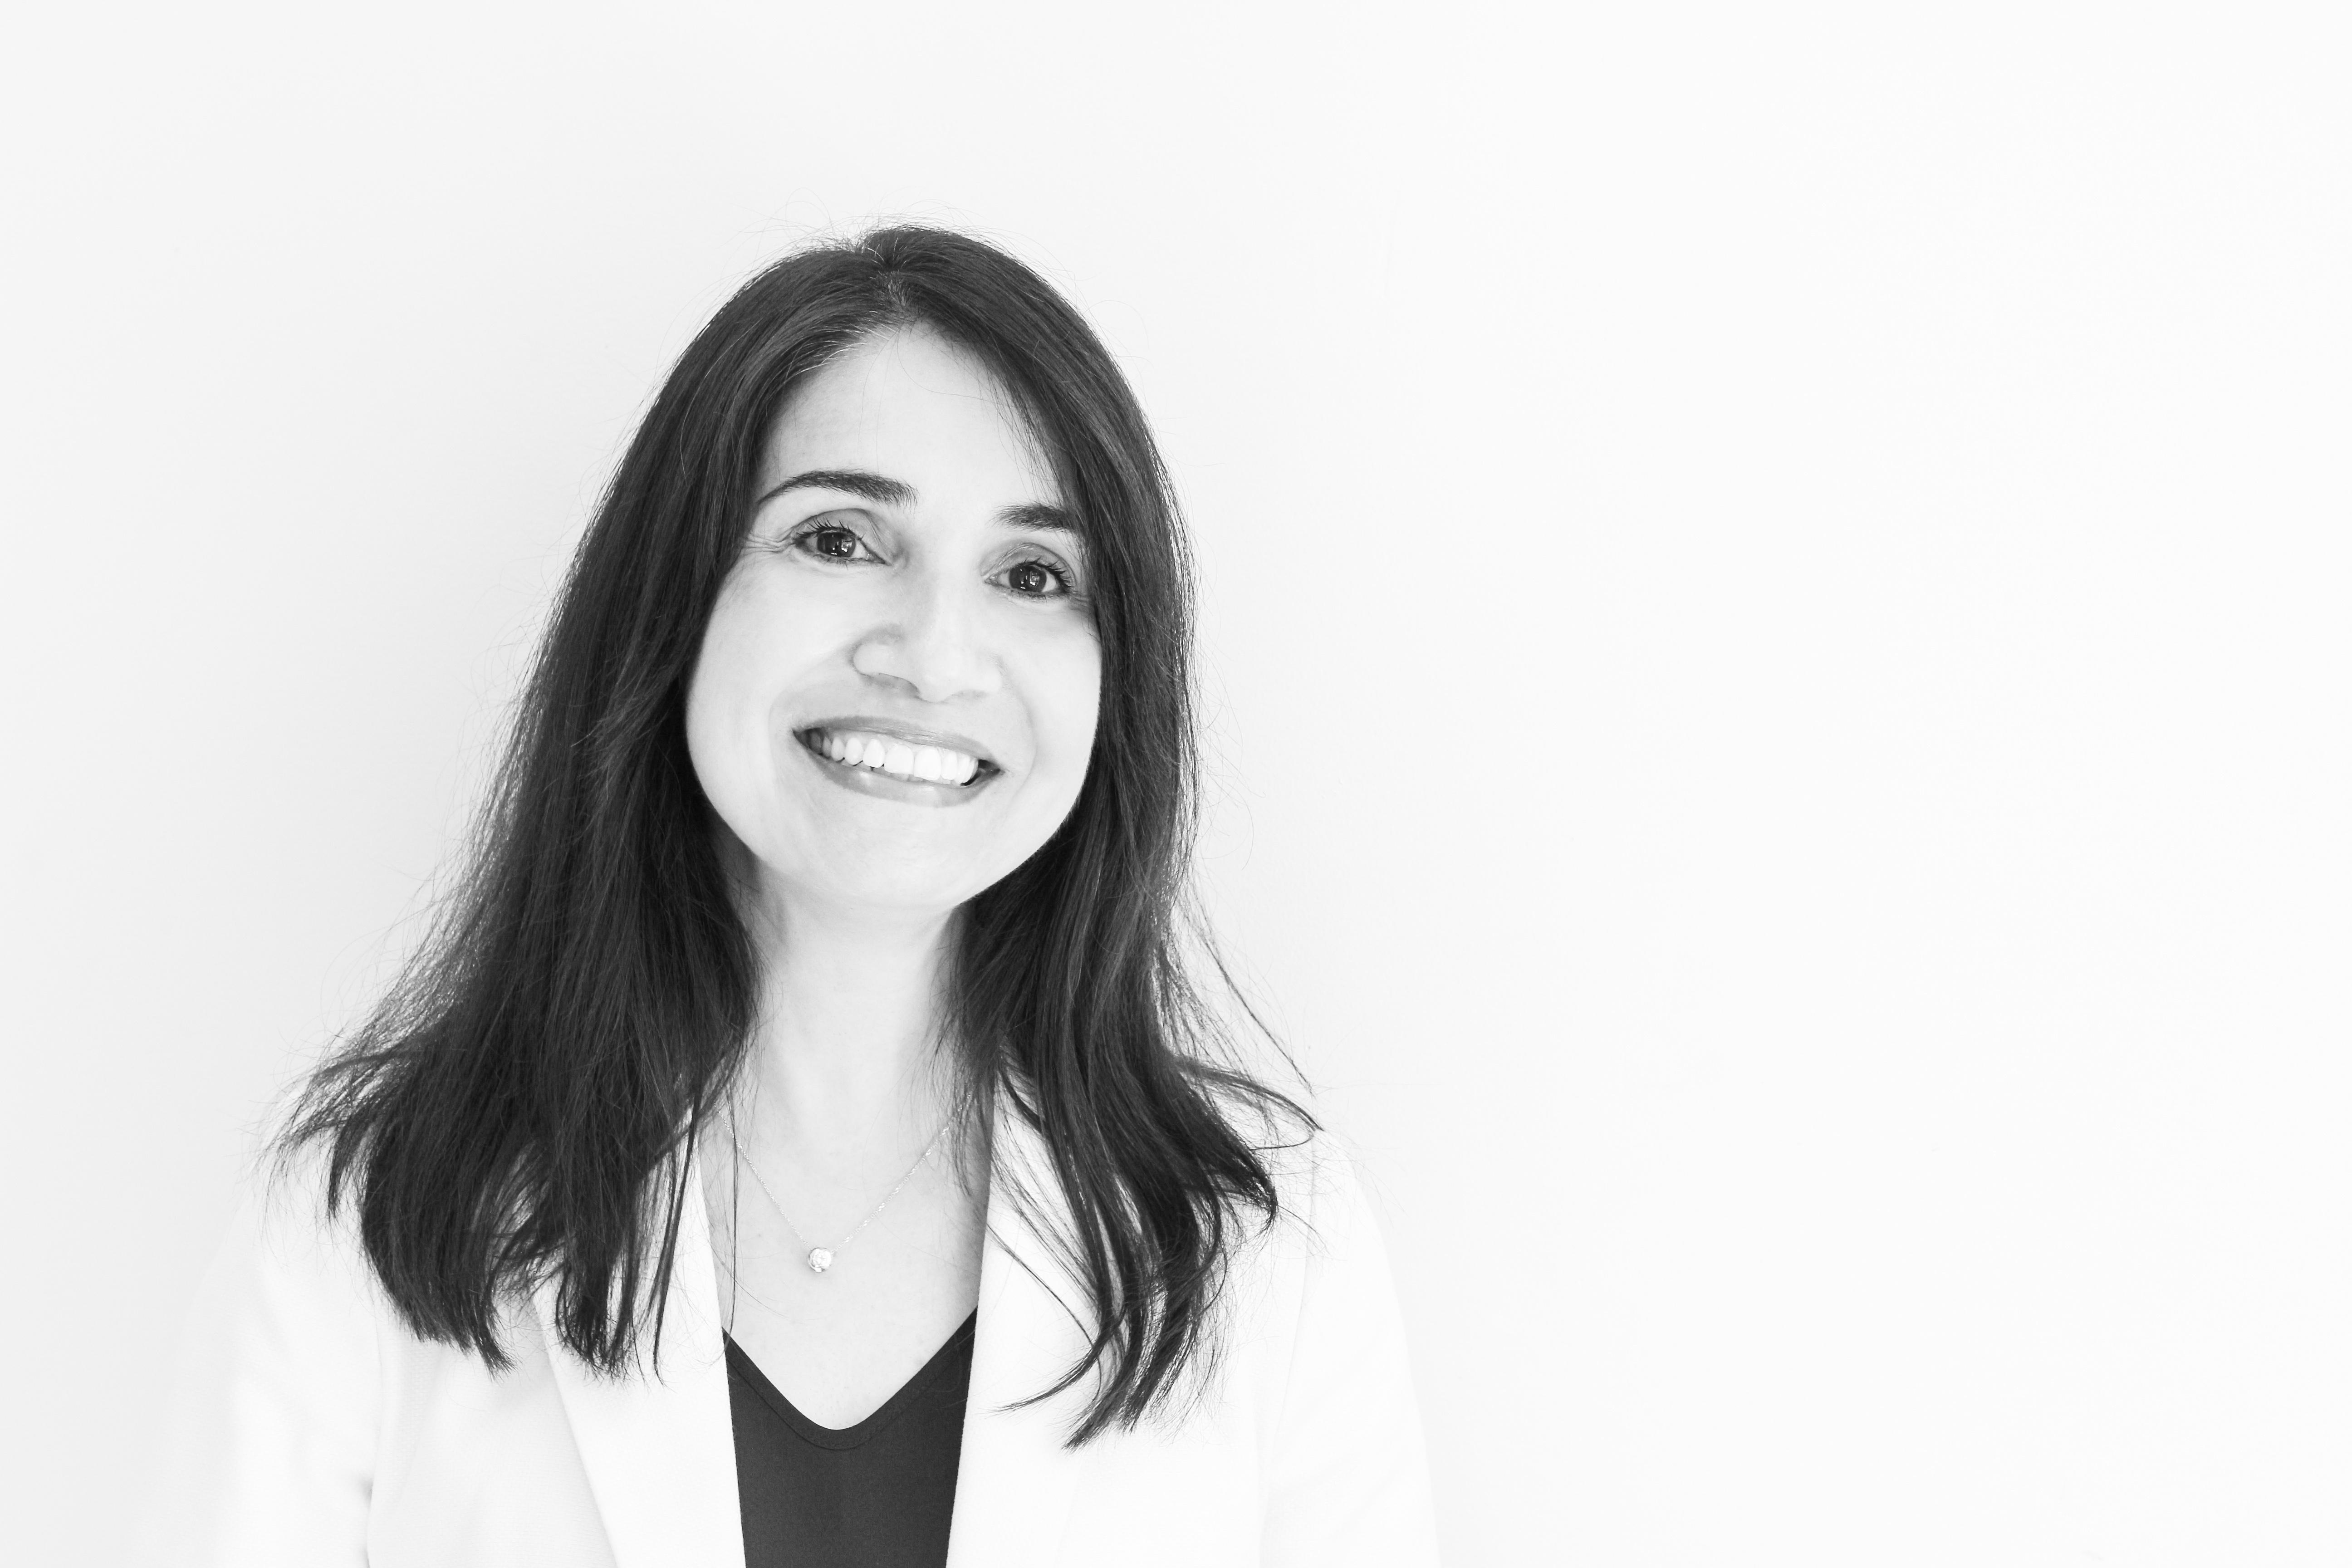 Carmen Macias, Director of Project Management